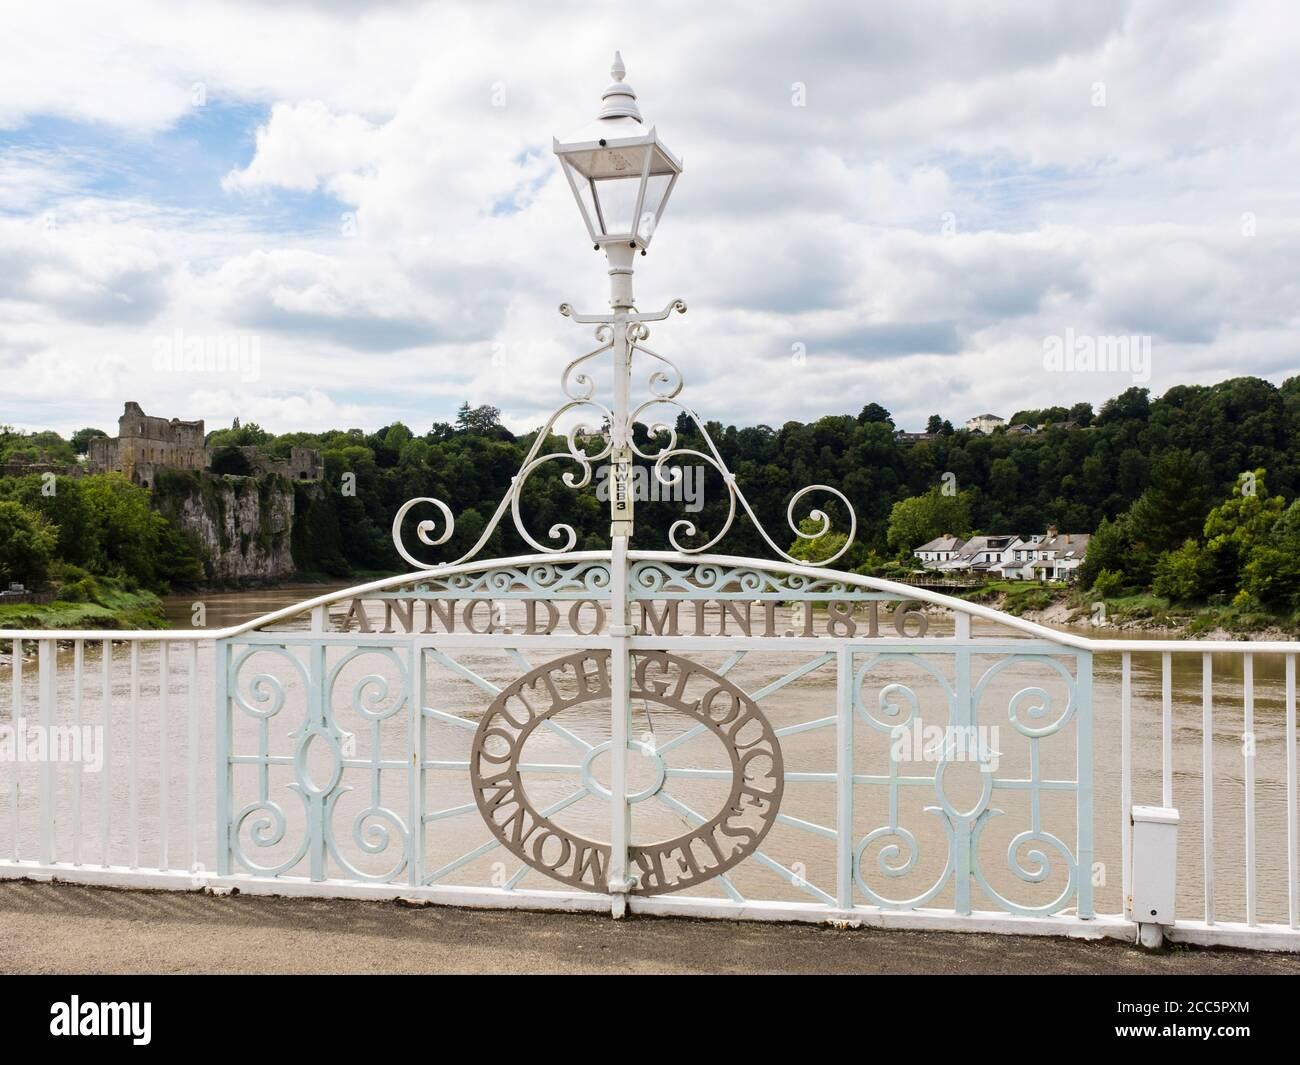 County boundary names on Old Wye Bridge (1816) spanning across River Wye on border between England and Wales. Tutshill, Gloucestershire, England, UK Stock Photo